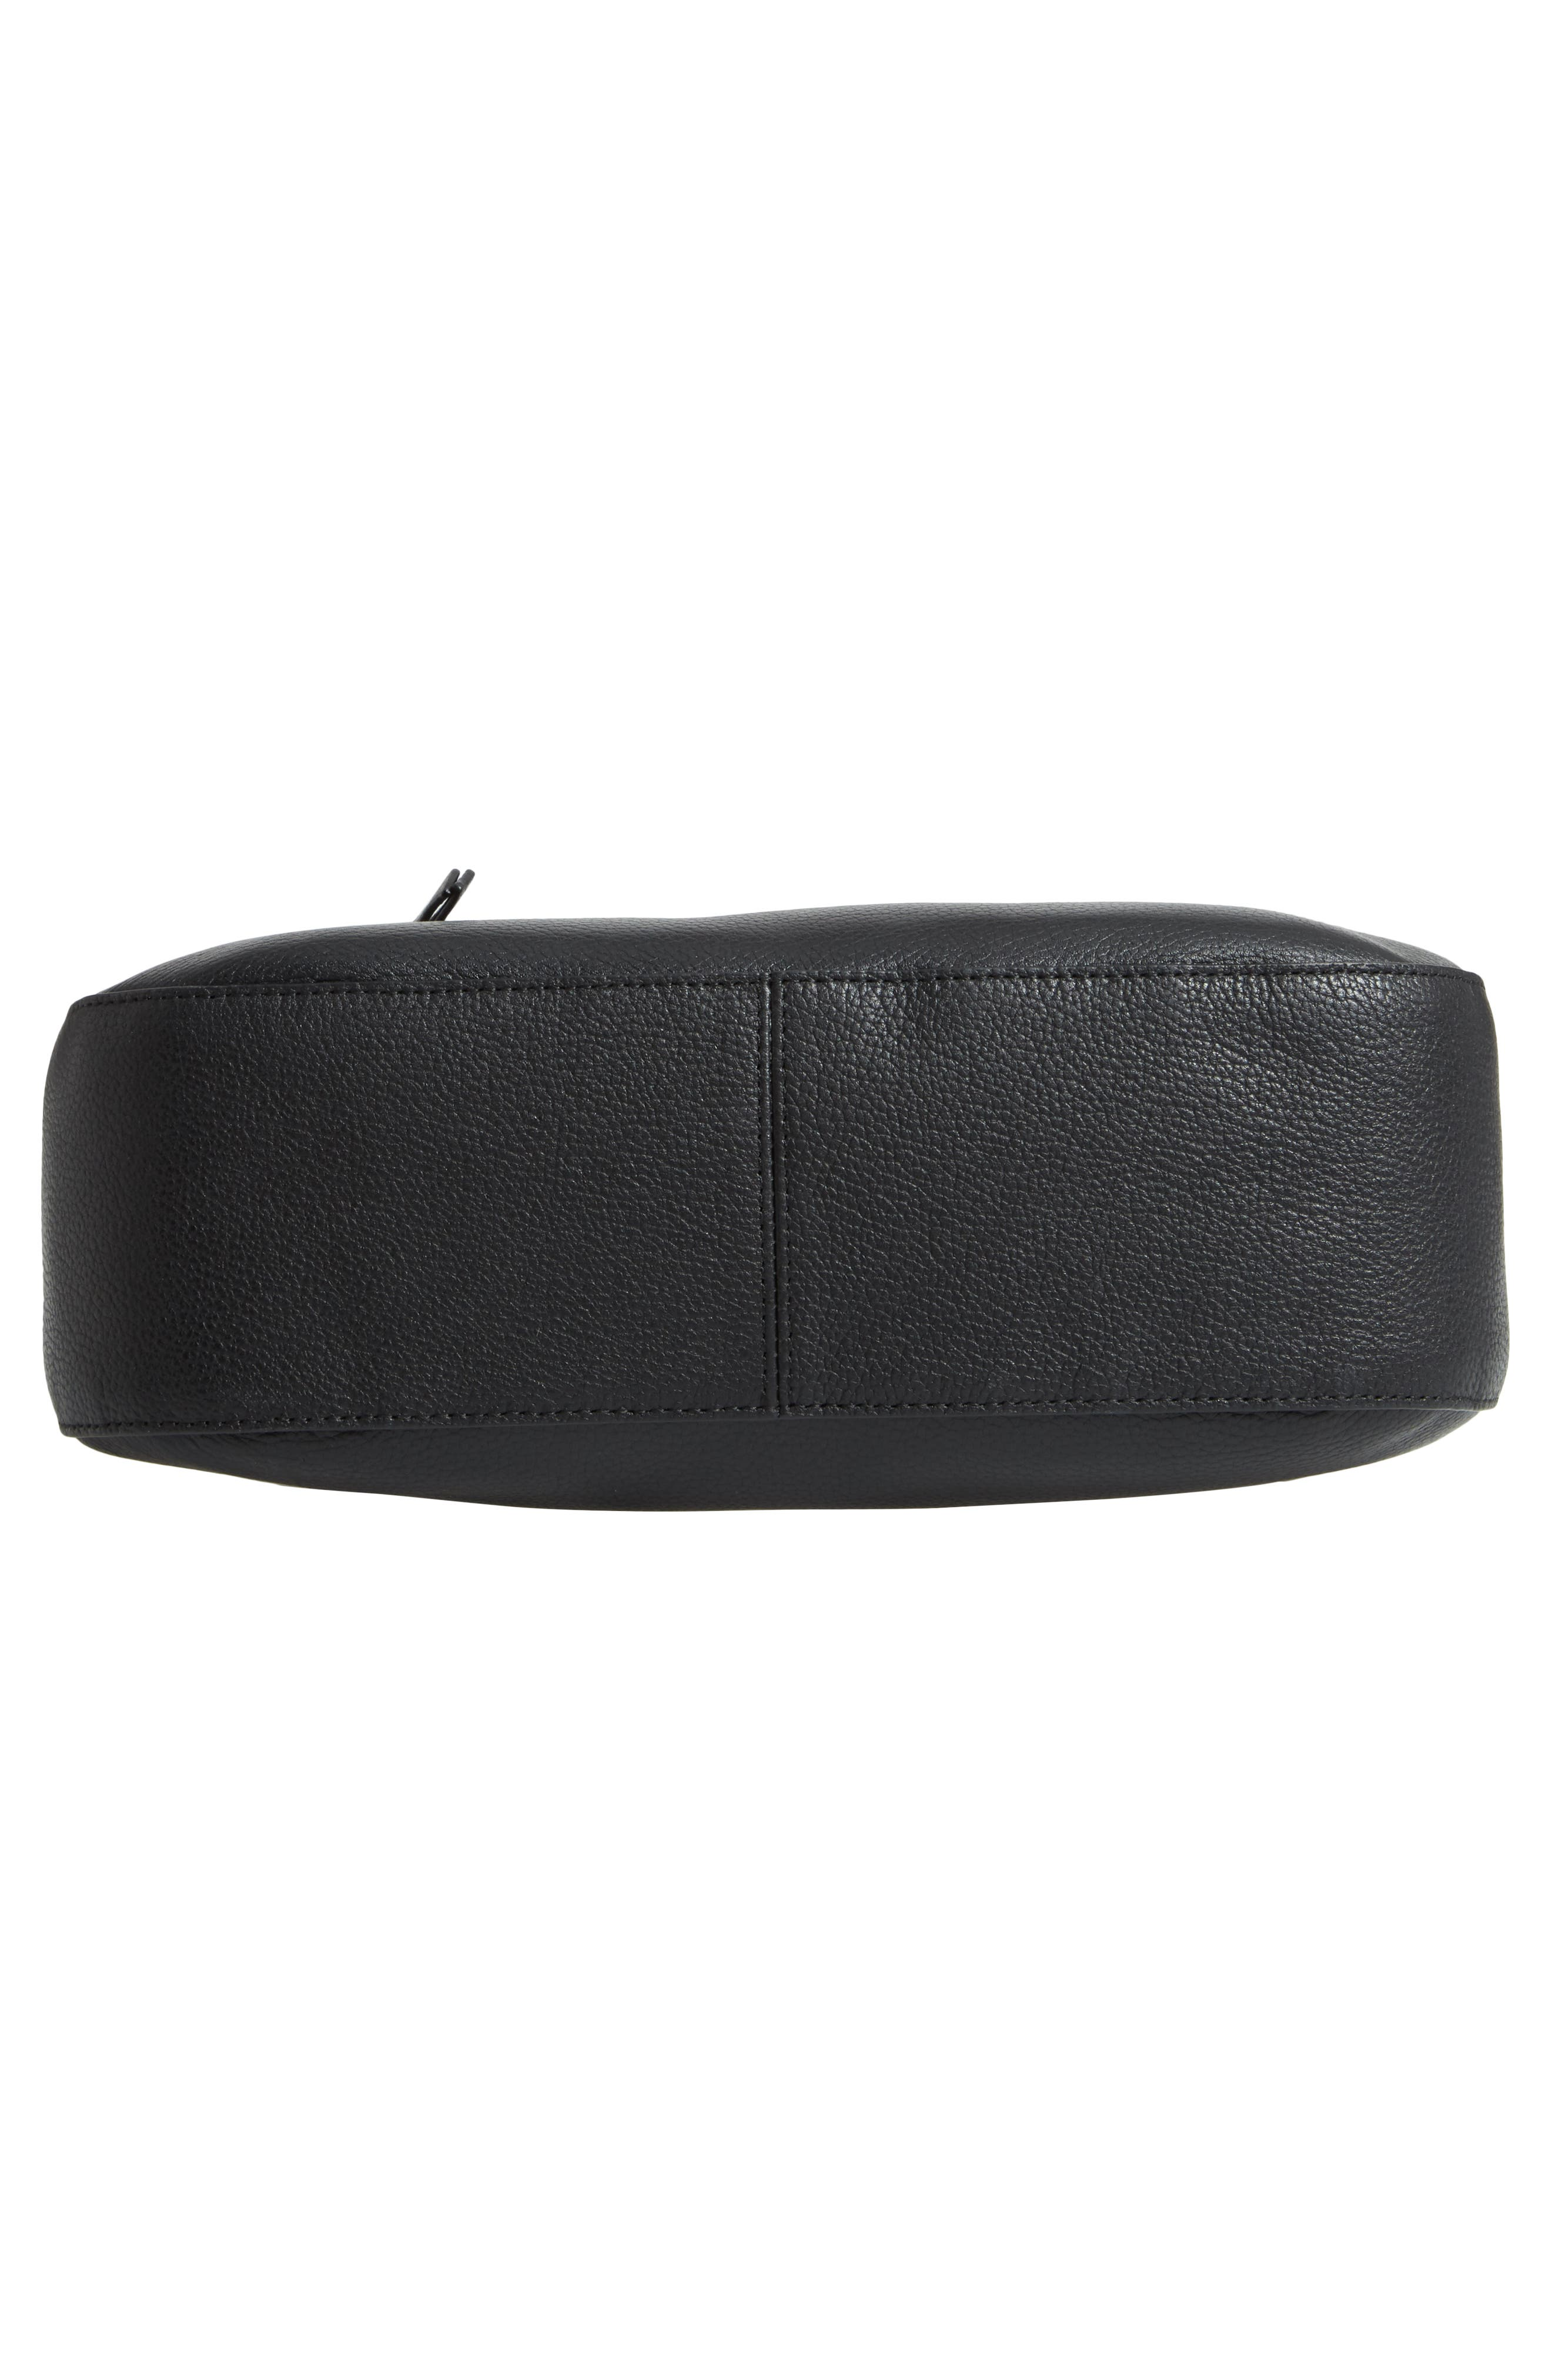 Finn Convertible Leather Hobo,                             Alternate thumbnail 7, color,                             BLACK